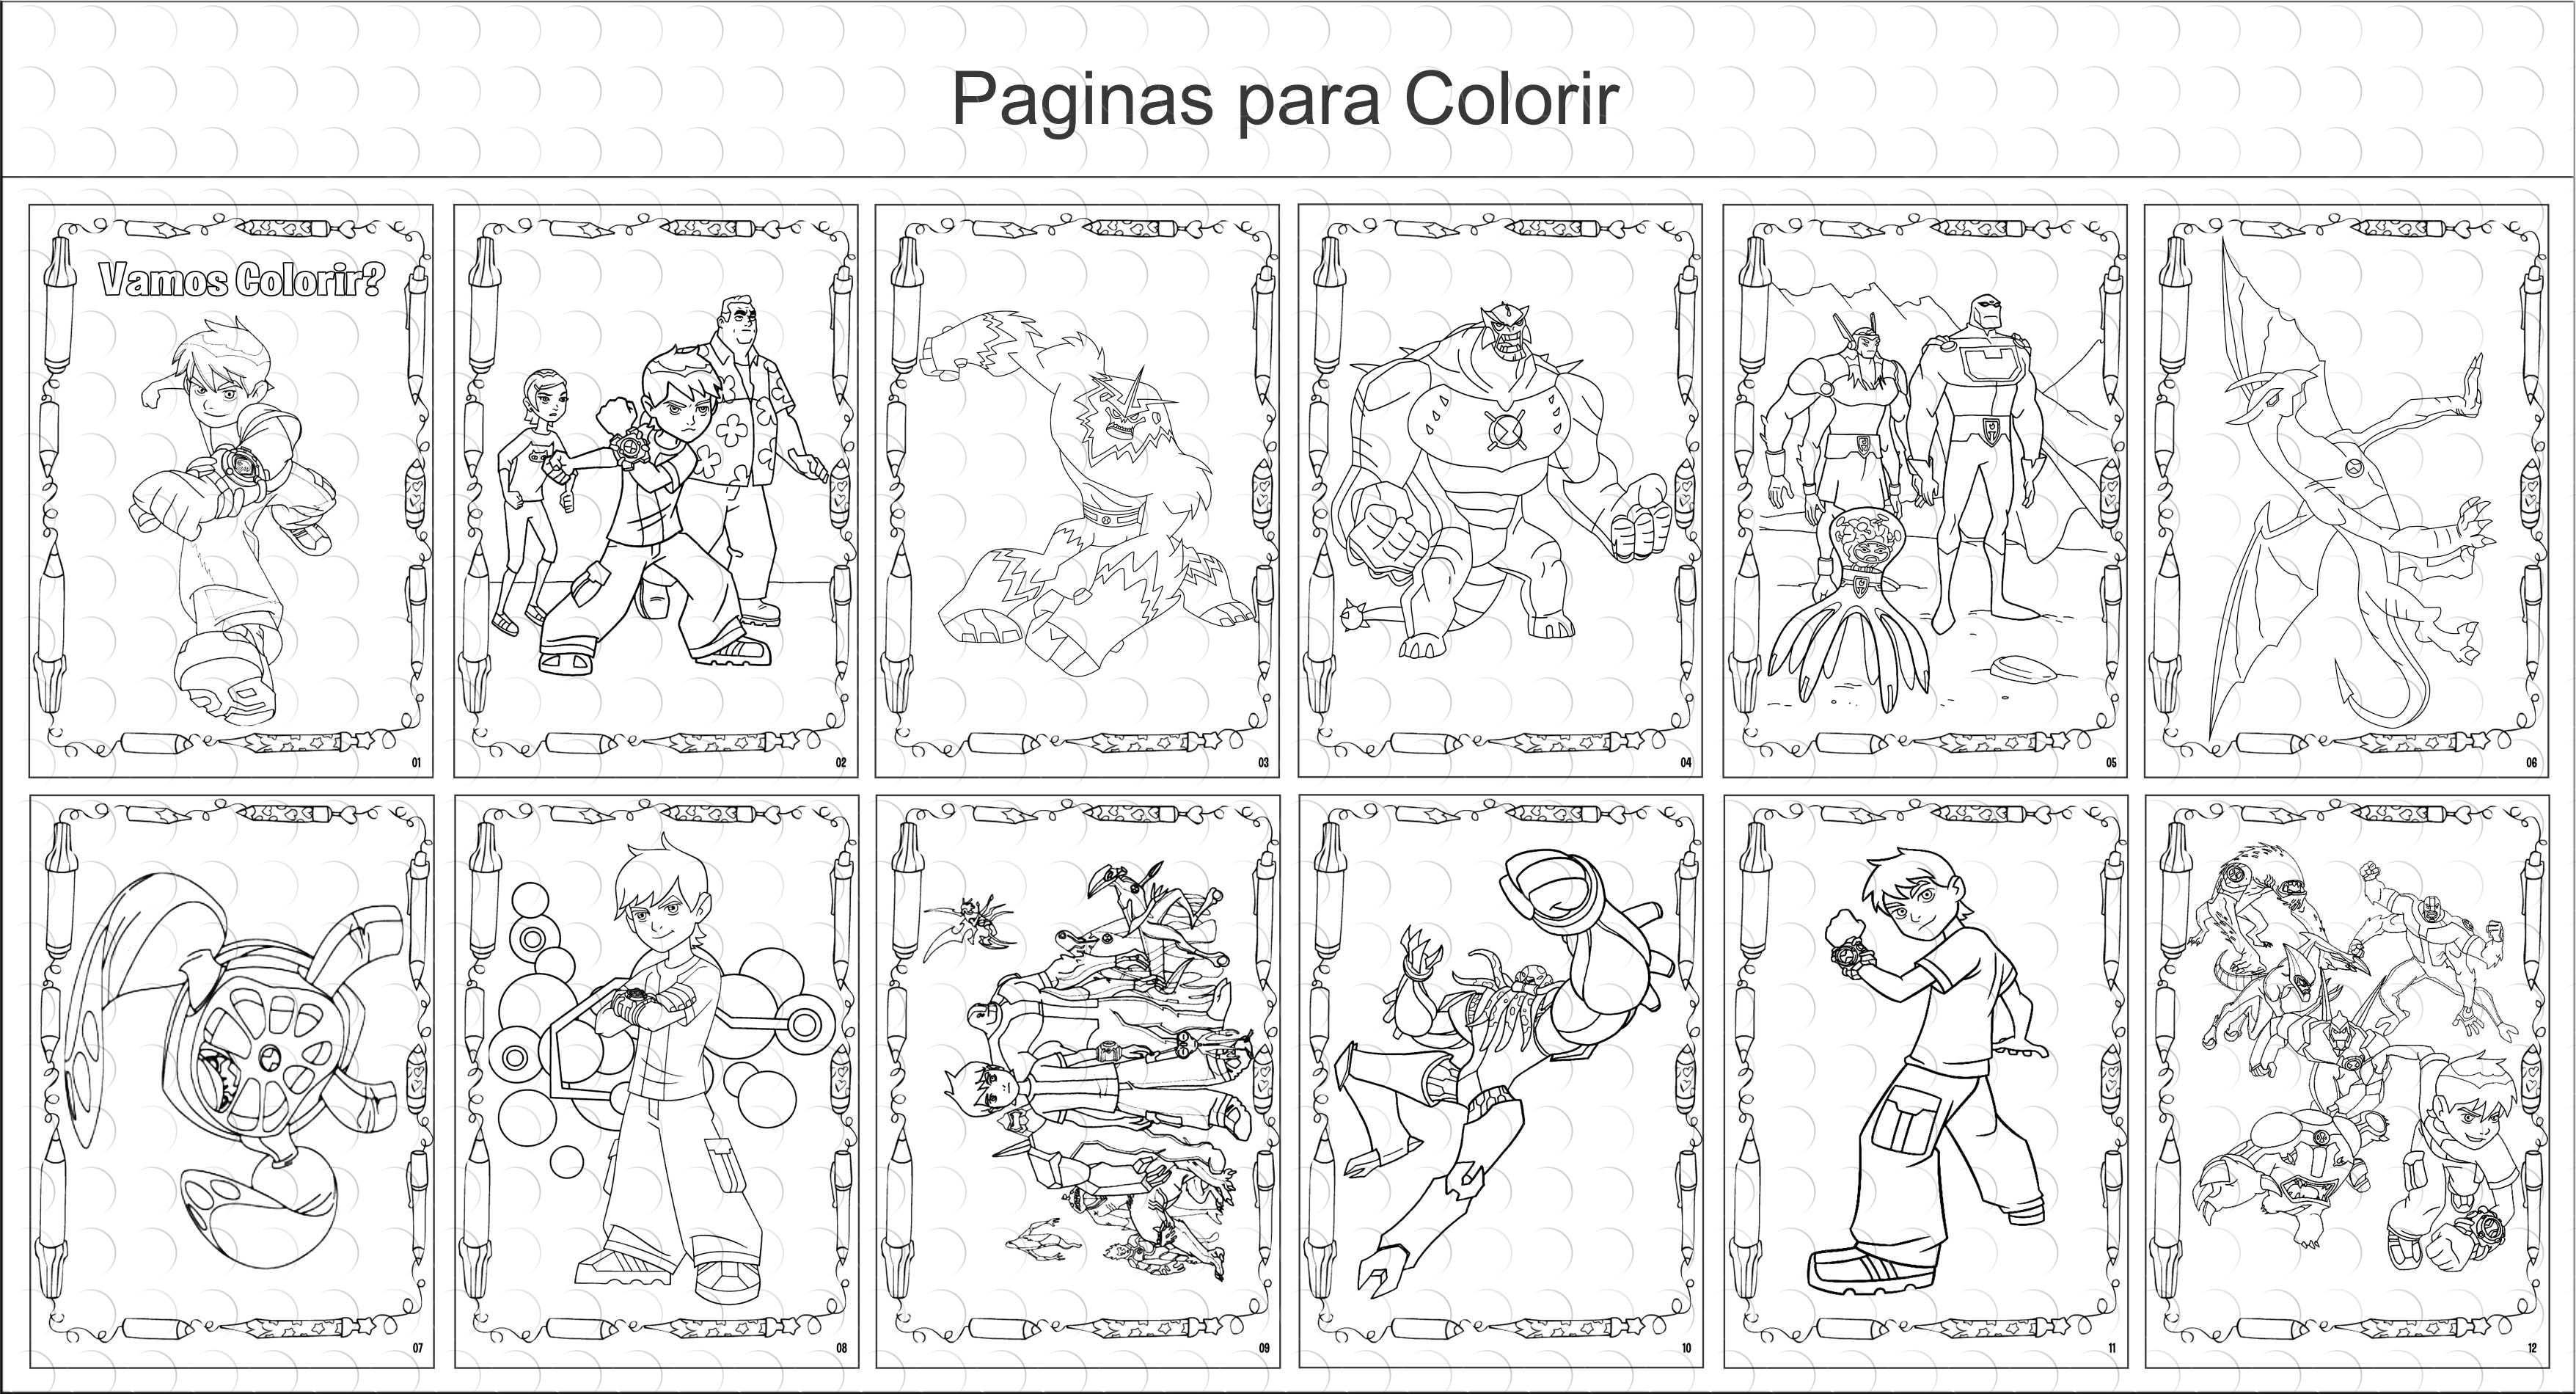 Livro De Colorir 10x15 Ben10 No Elo7 G A Personalize F4ede8